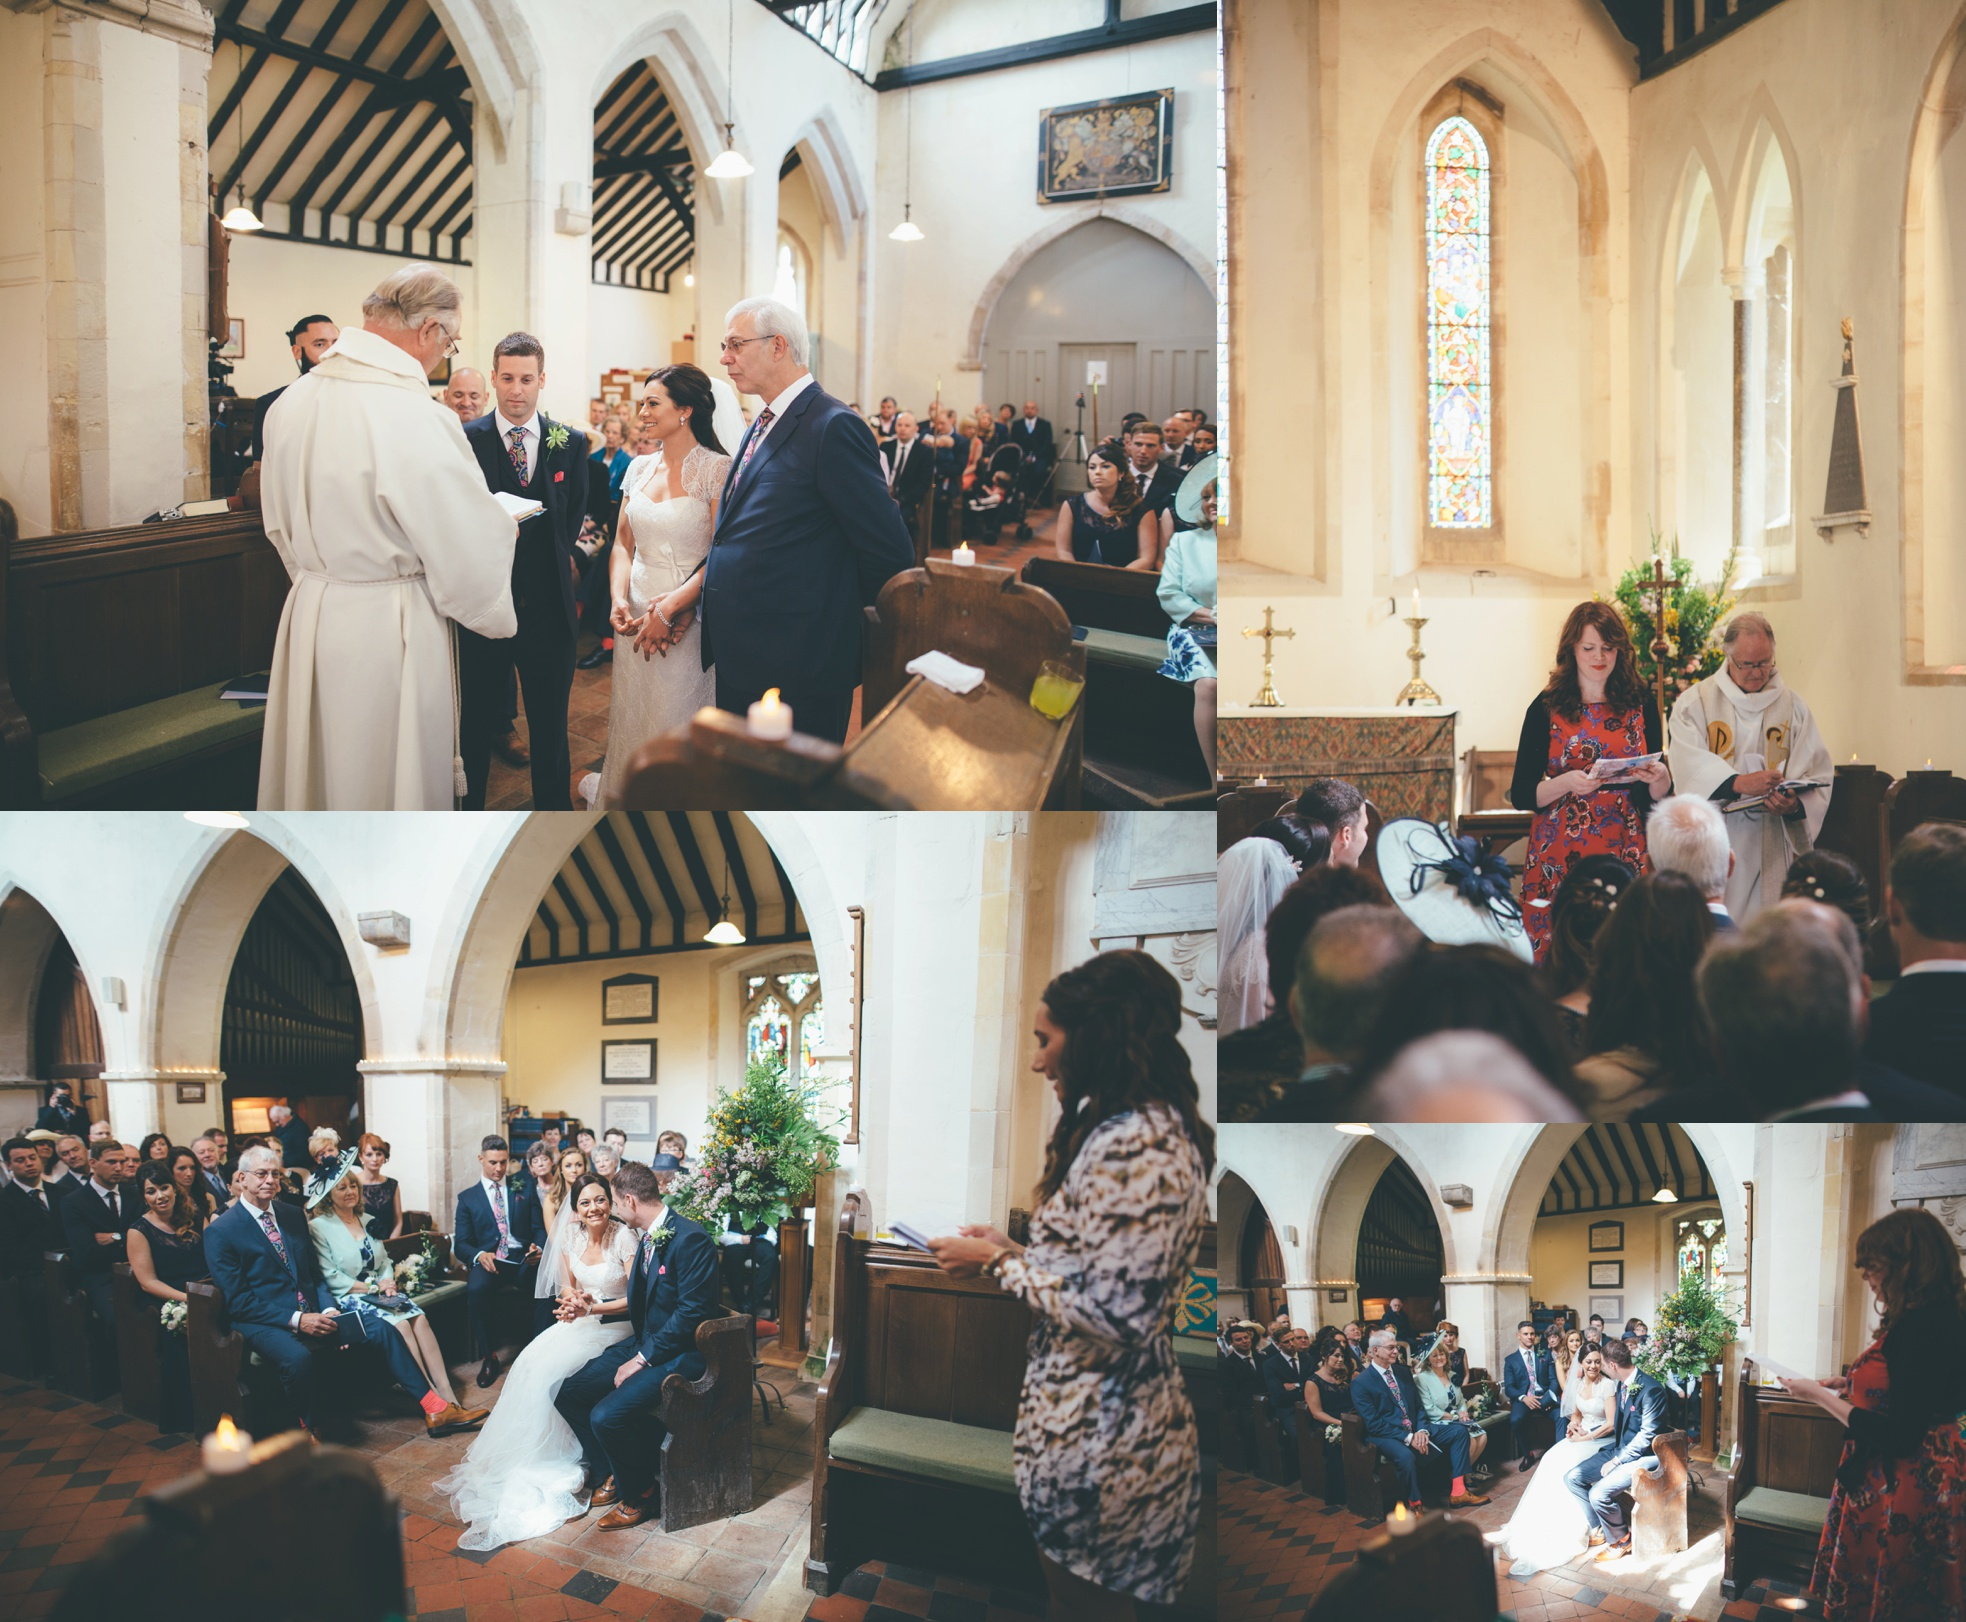 ClaireKieranwedding_PrestonCourtCanterbury_0013.jpg